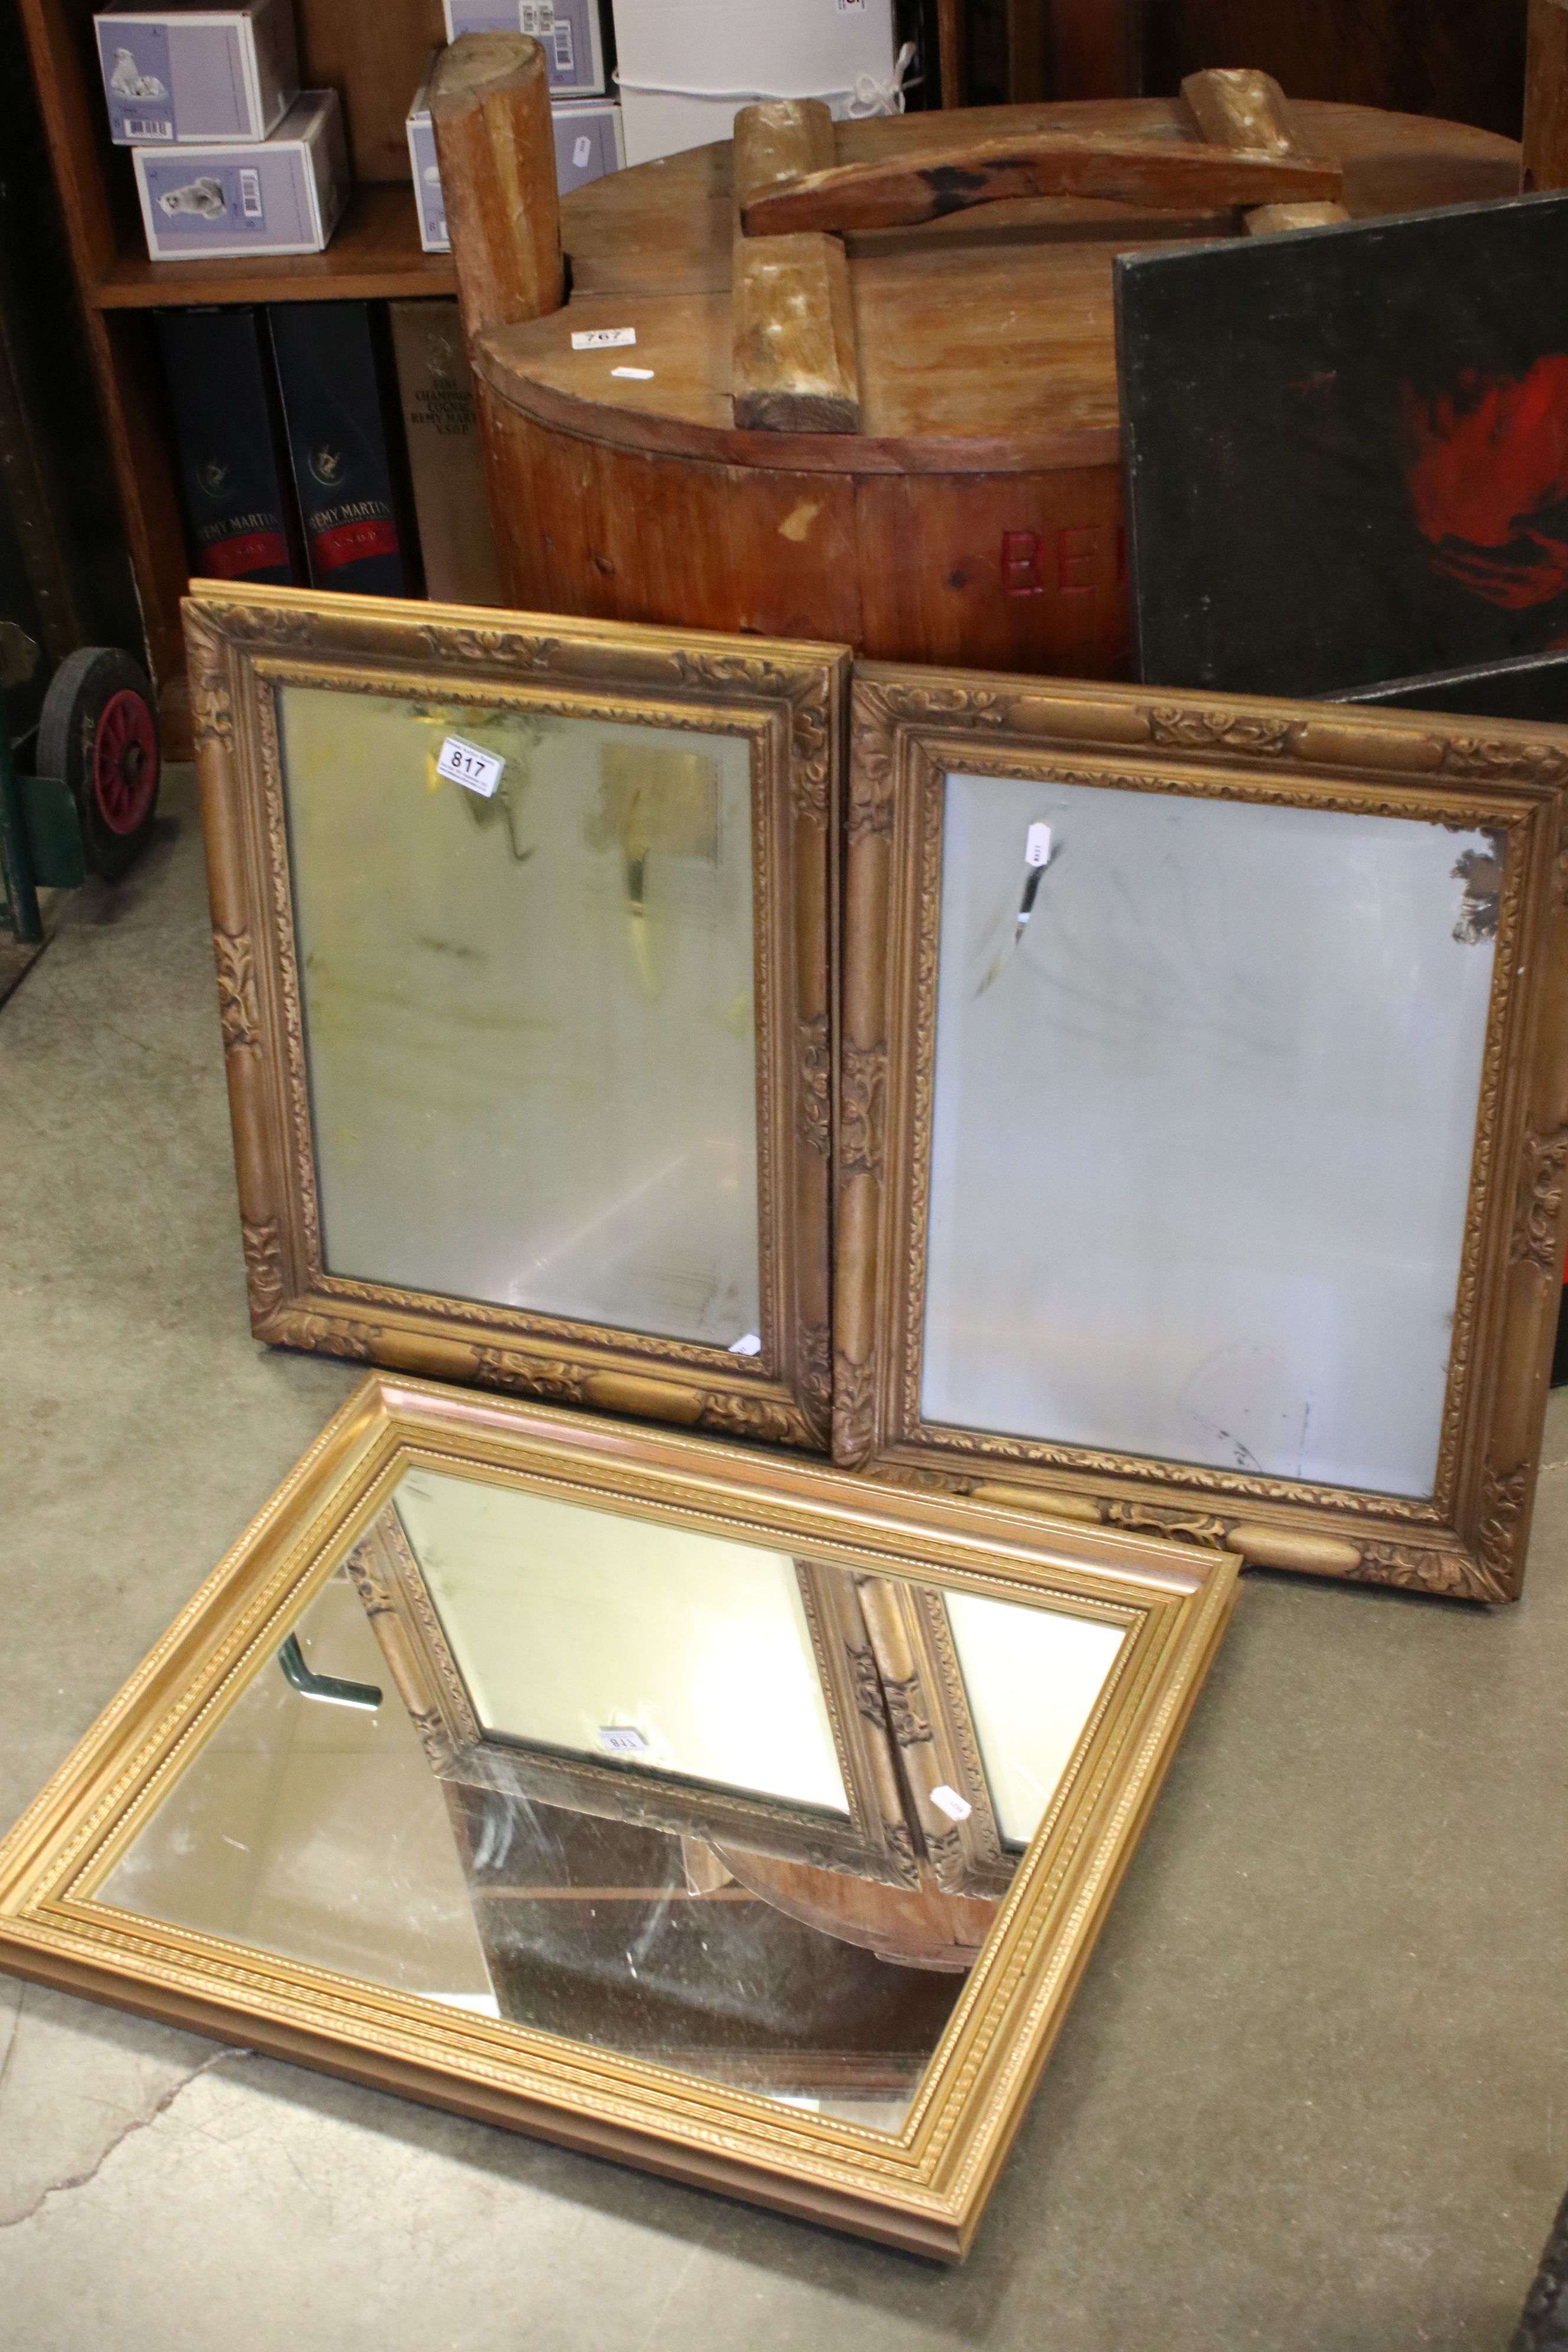 Pair of Rectangular Gilt Framed Mirrors, 44cms x 54cms together with another Gilt Framed Mirror